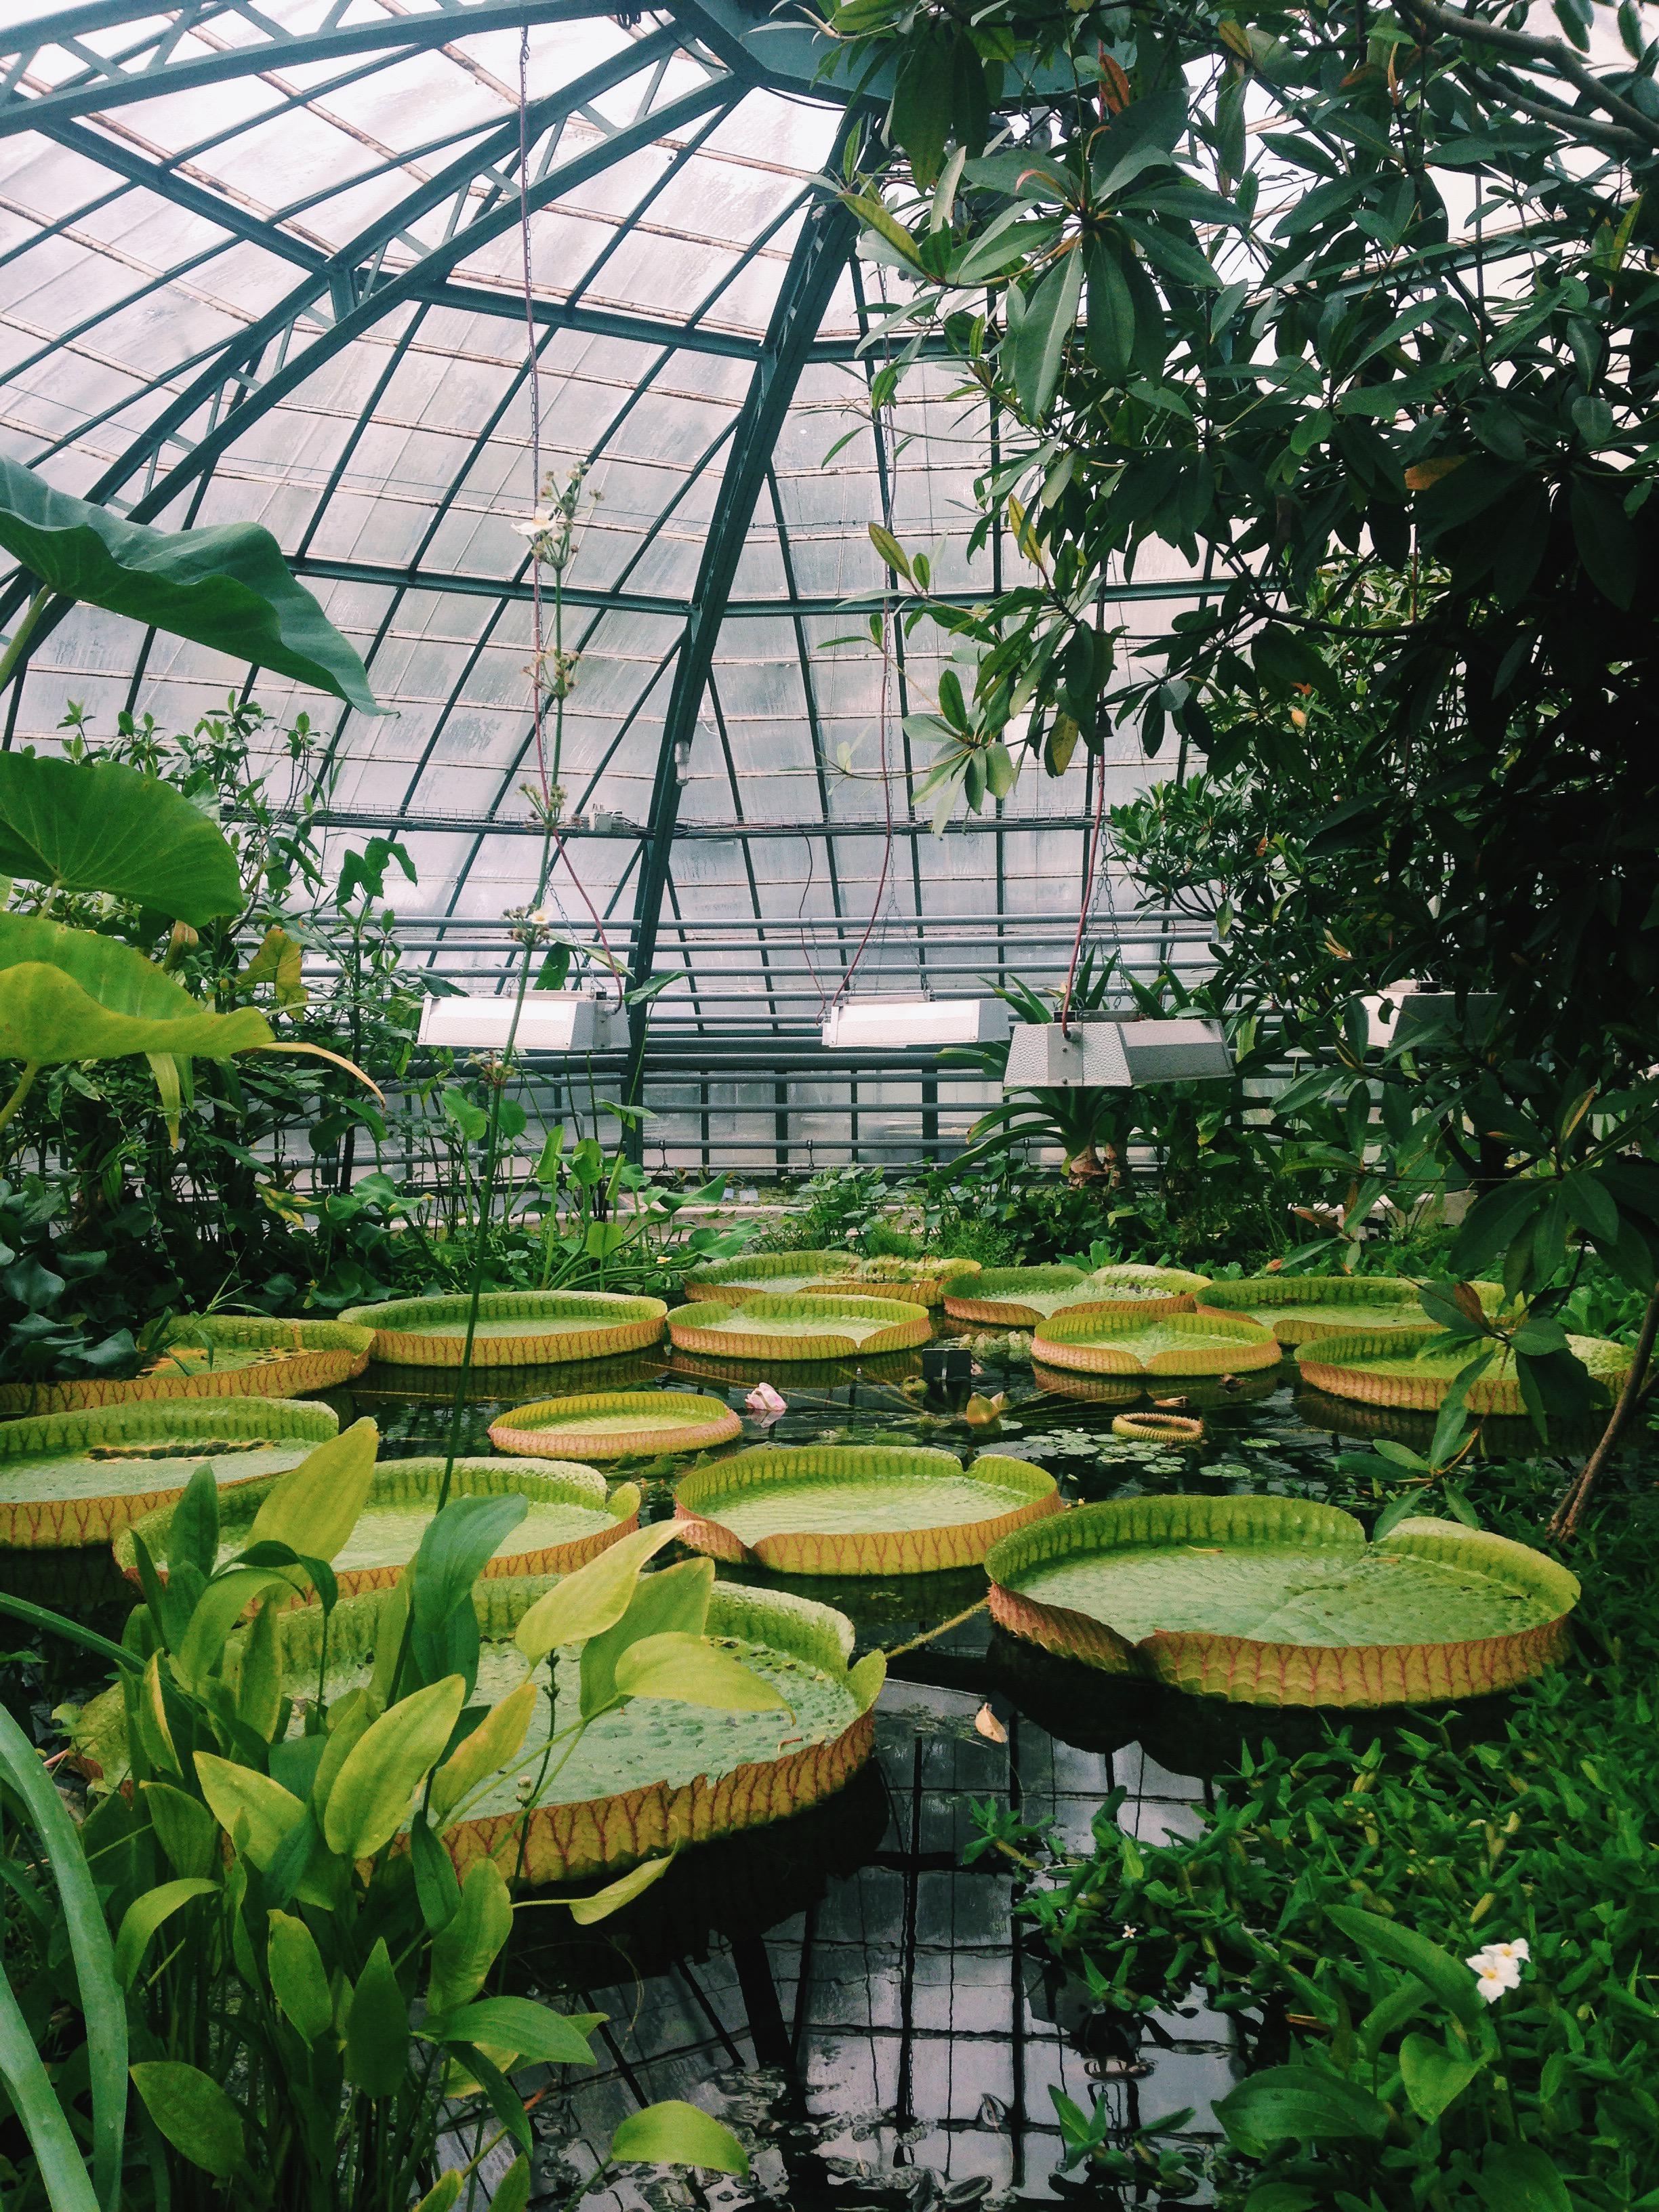 Viktoriahaus, Botanischer Garten der Universität Basel, 2015